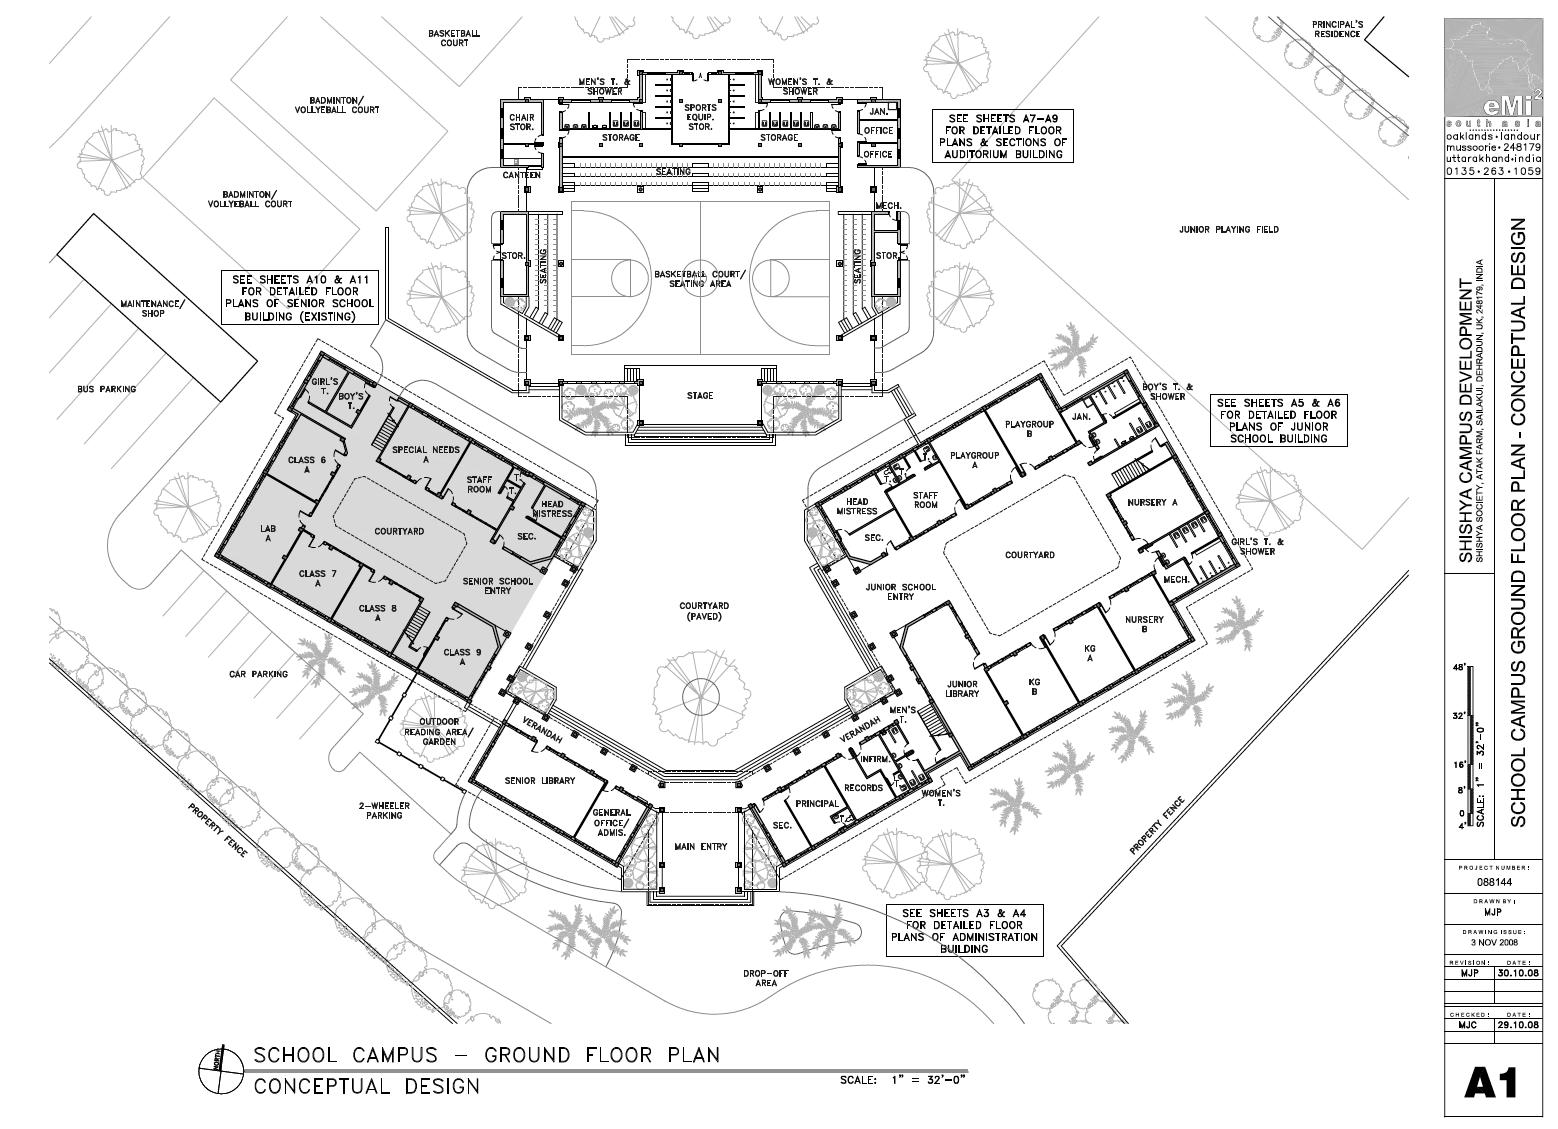 Campus Master Plan & School Design for Shishya Society